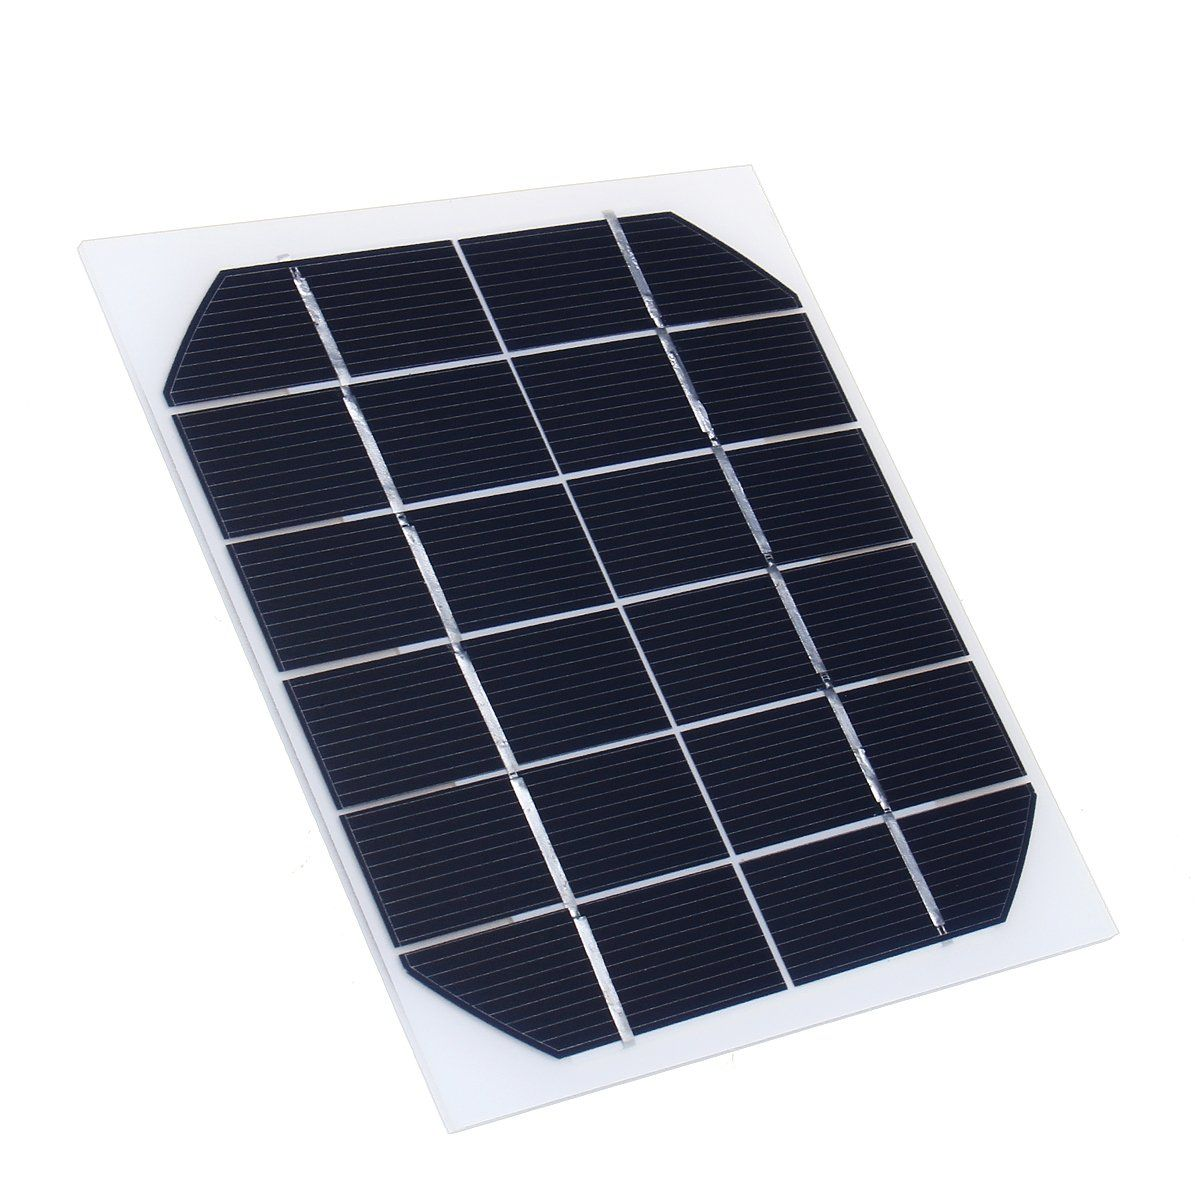 5pcs 6v 350ma Monocrystalline 2w Mini Solar Panel Photovoltaic Panel Mini Solar Panel Photovoltaic Panels Solar Panels For Home